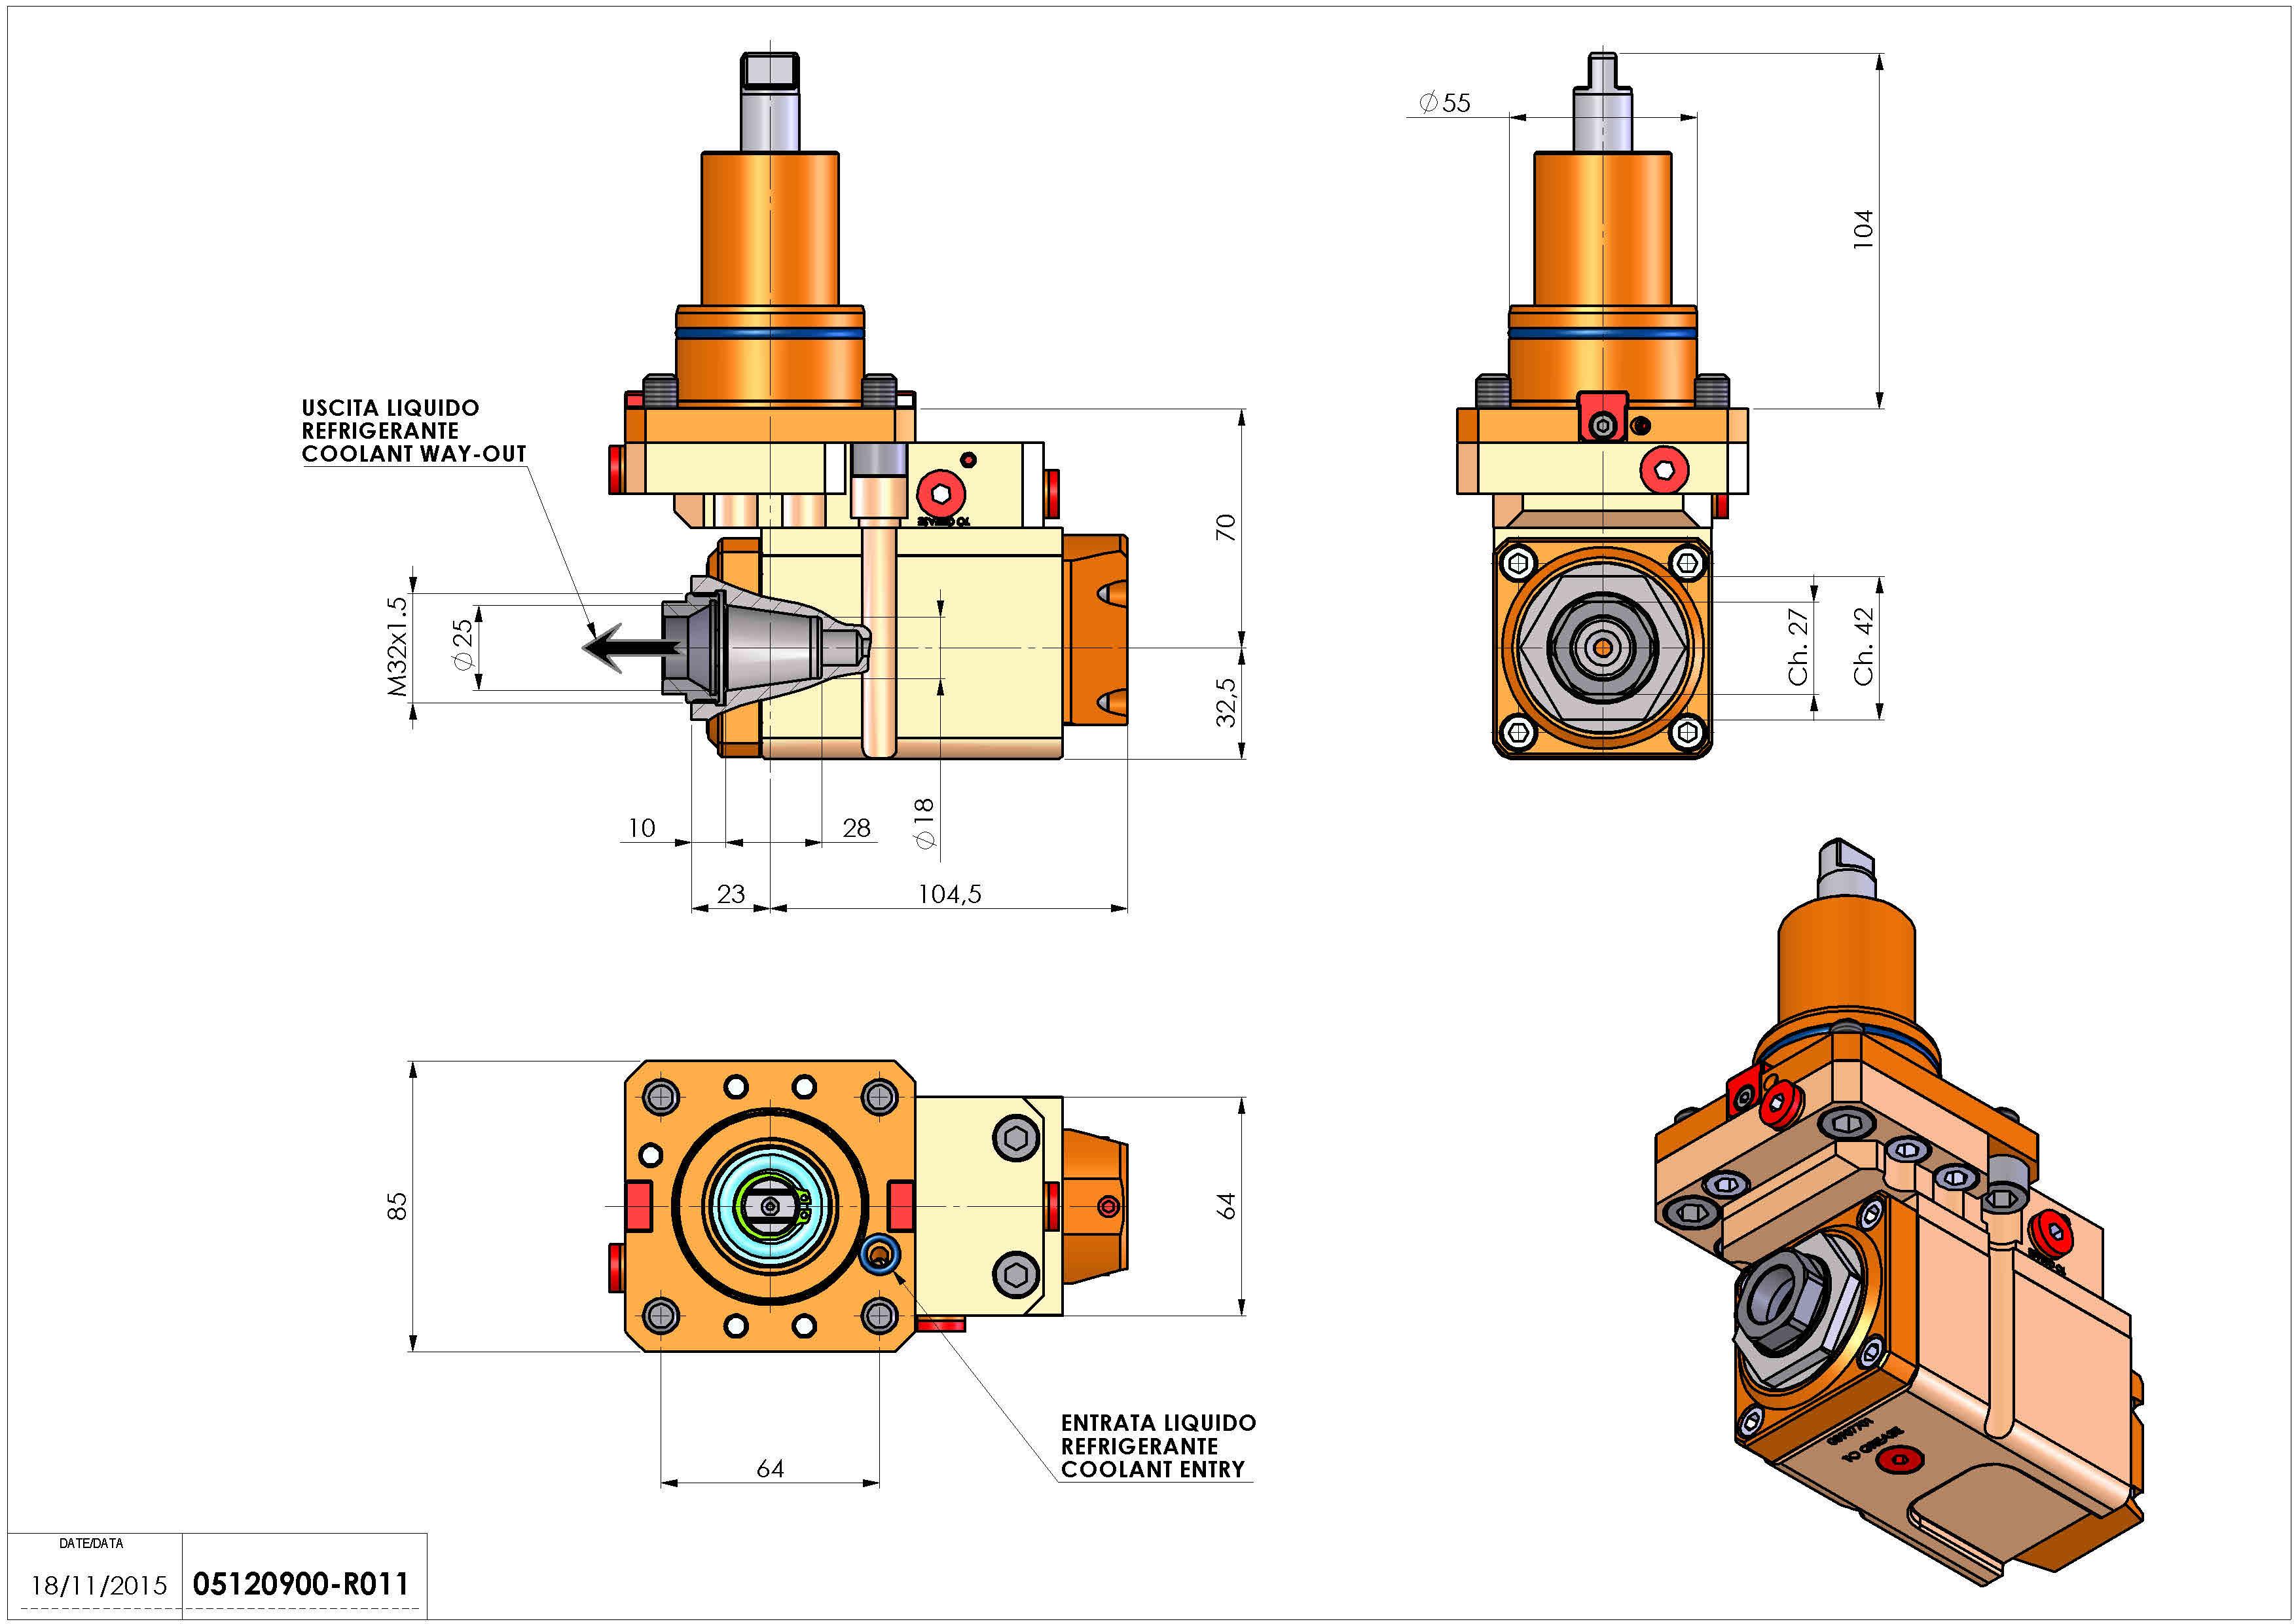 Technical image - LT-A BMT55 ER25F RF OFS H70 DW.